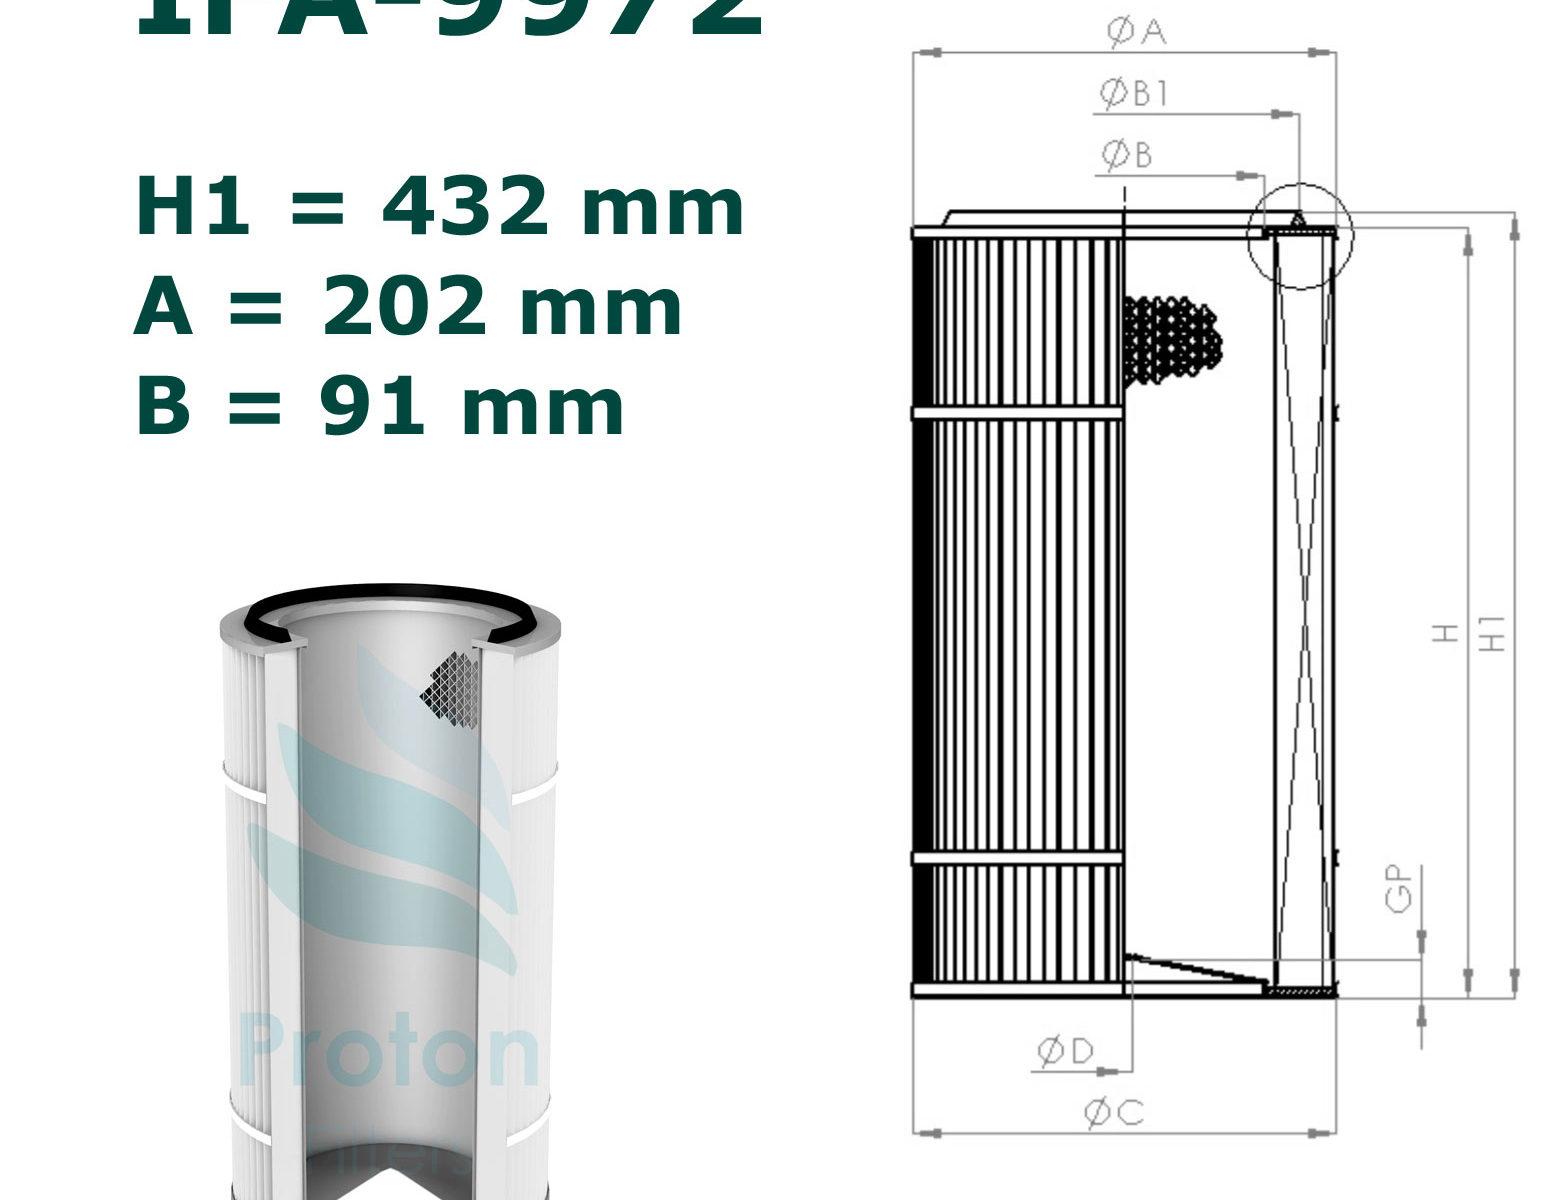 IFA-9972-1565x1200